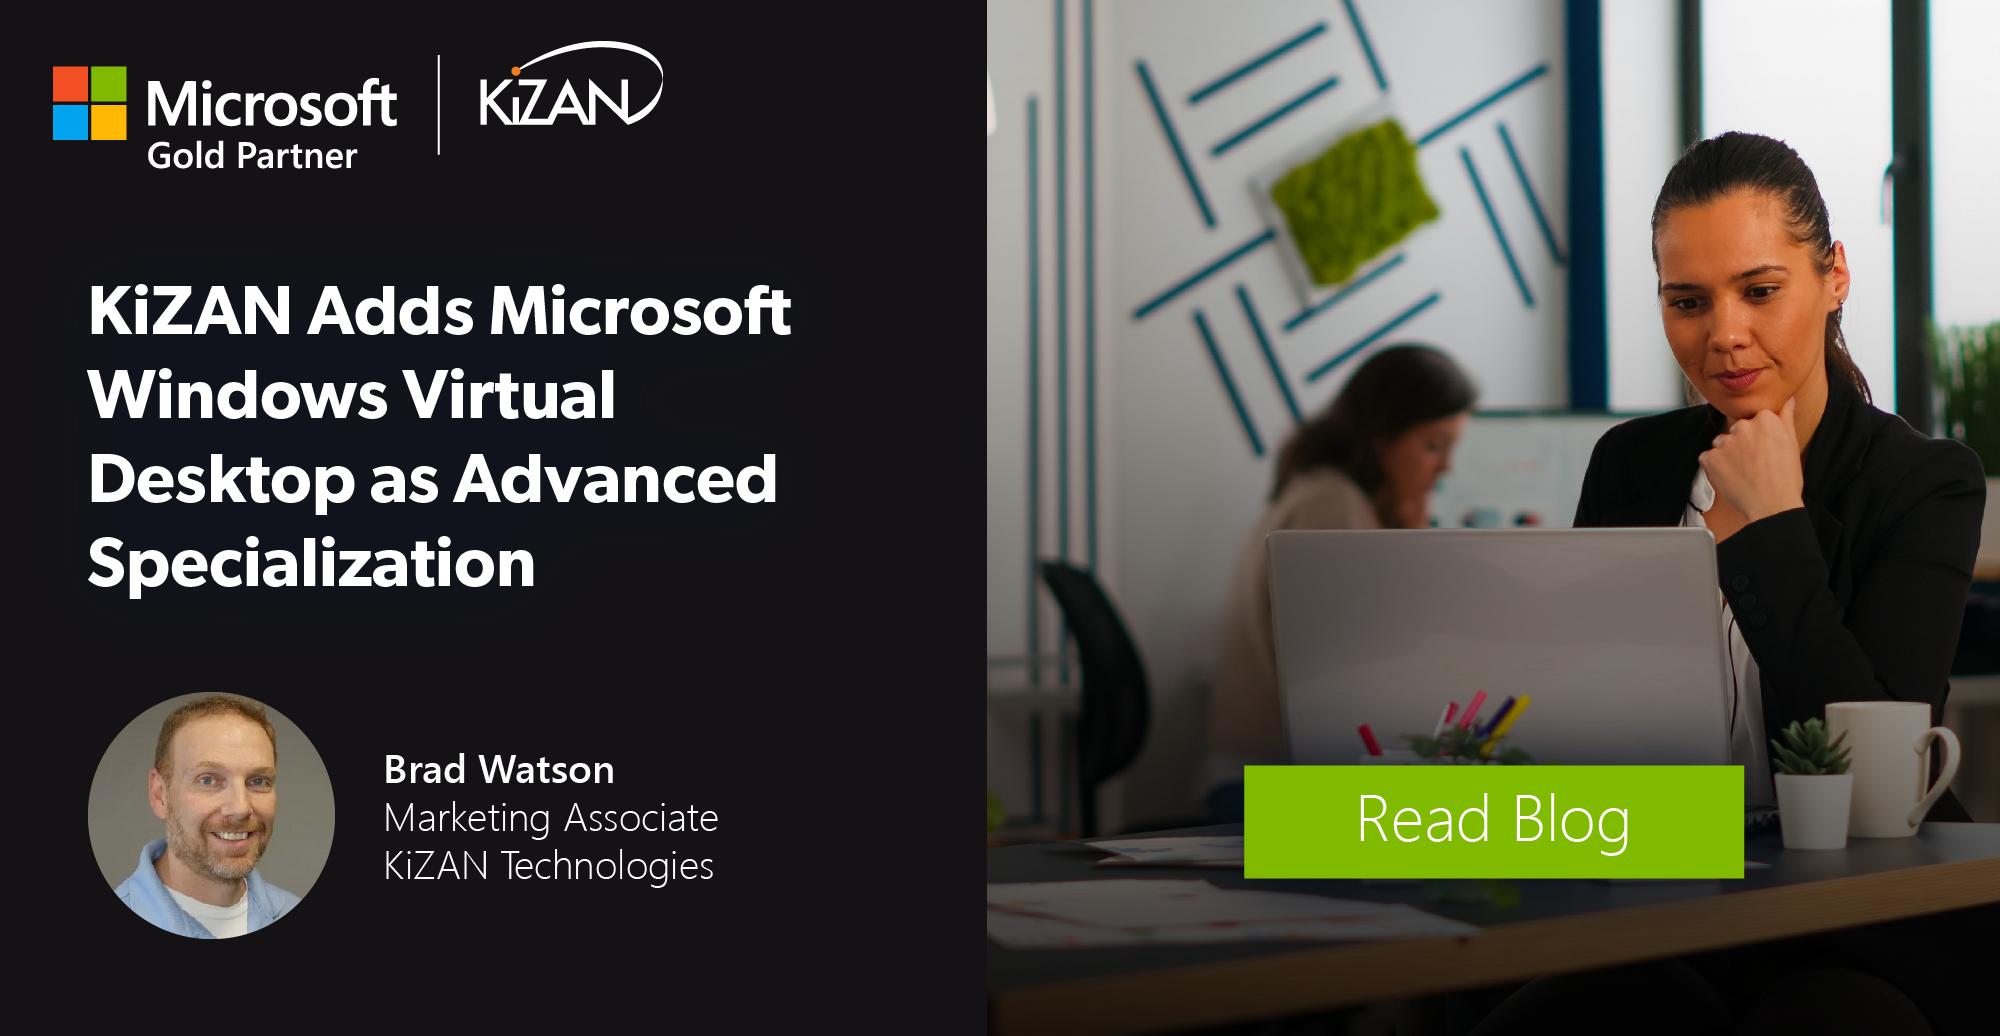 KiZAN Adds Microsoft Windows Virtual Desktop as Advanced Specialization